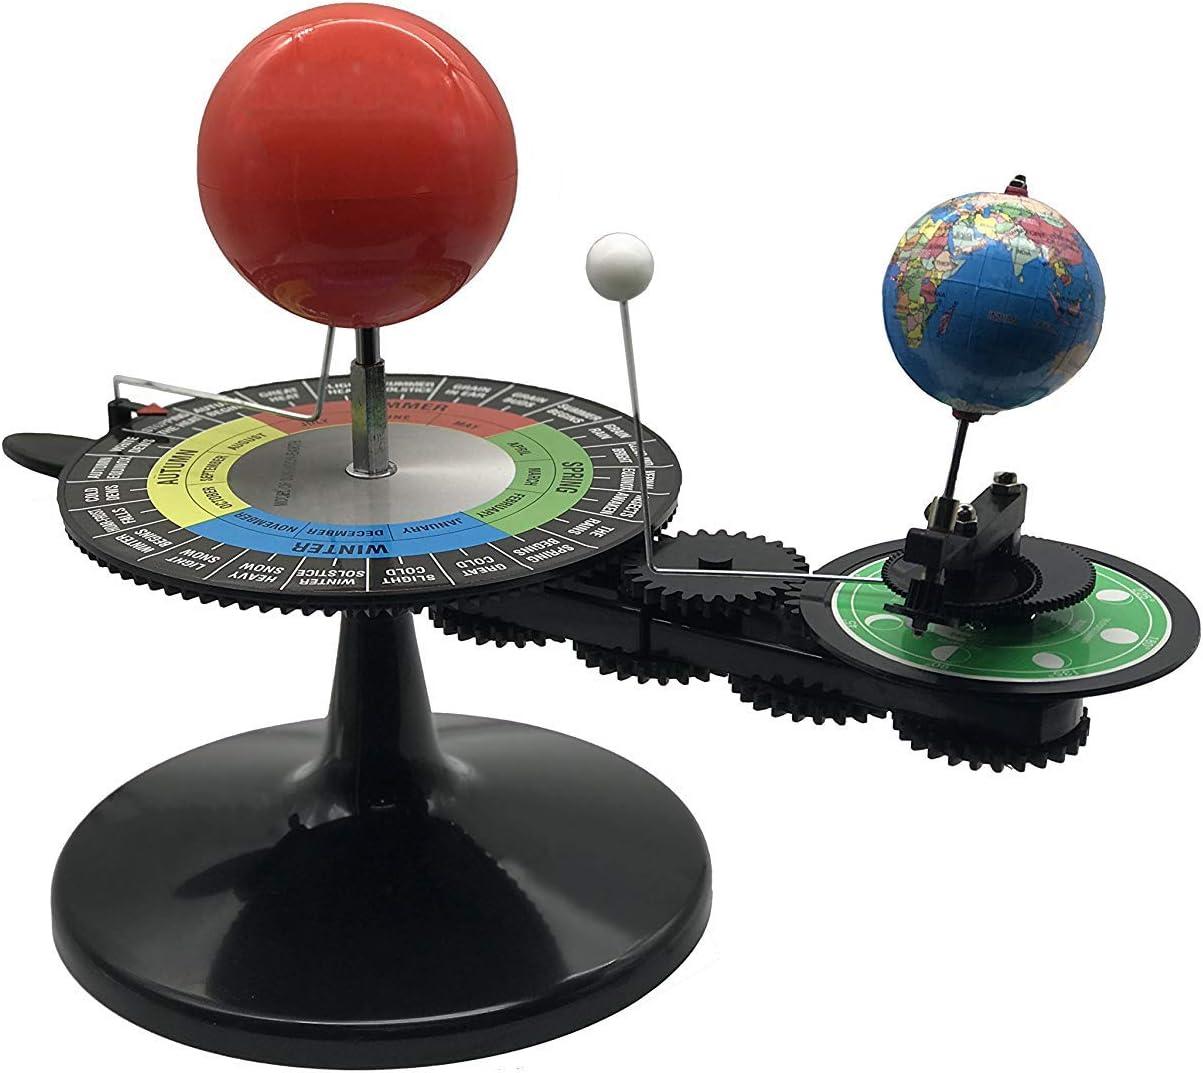 Amazon.com: Aikeec - Planetario orbital con sistema solar ...